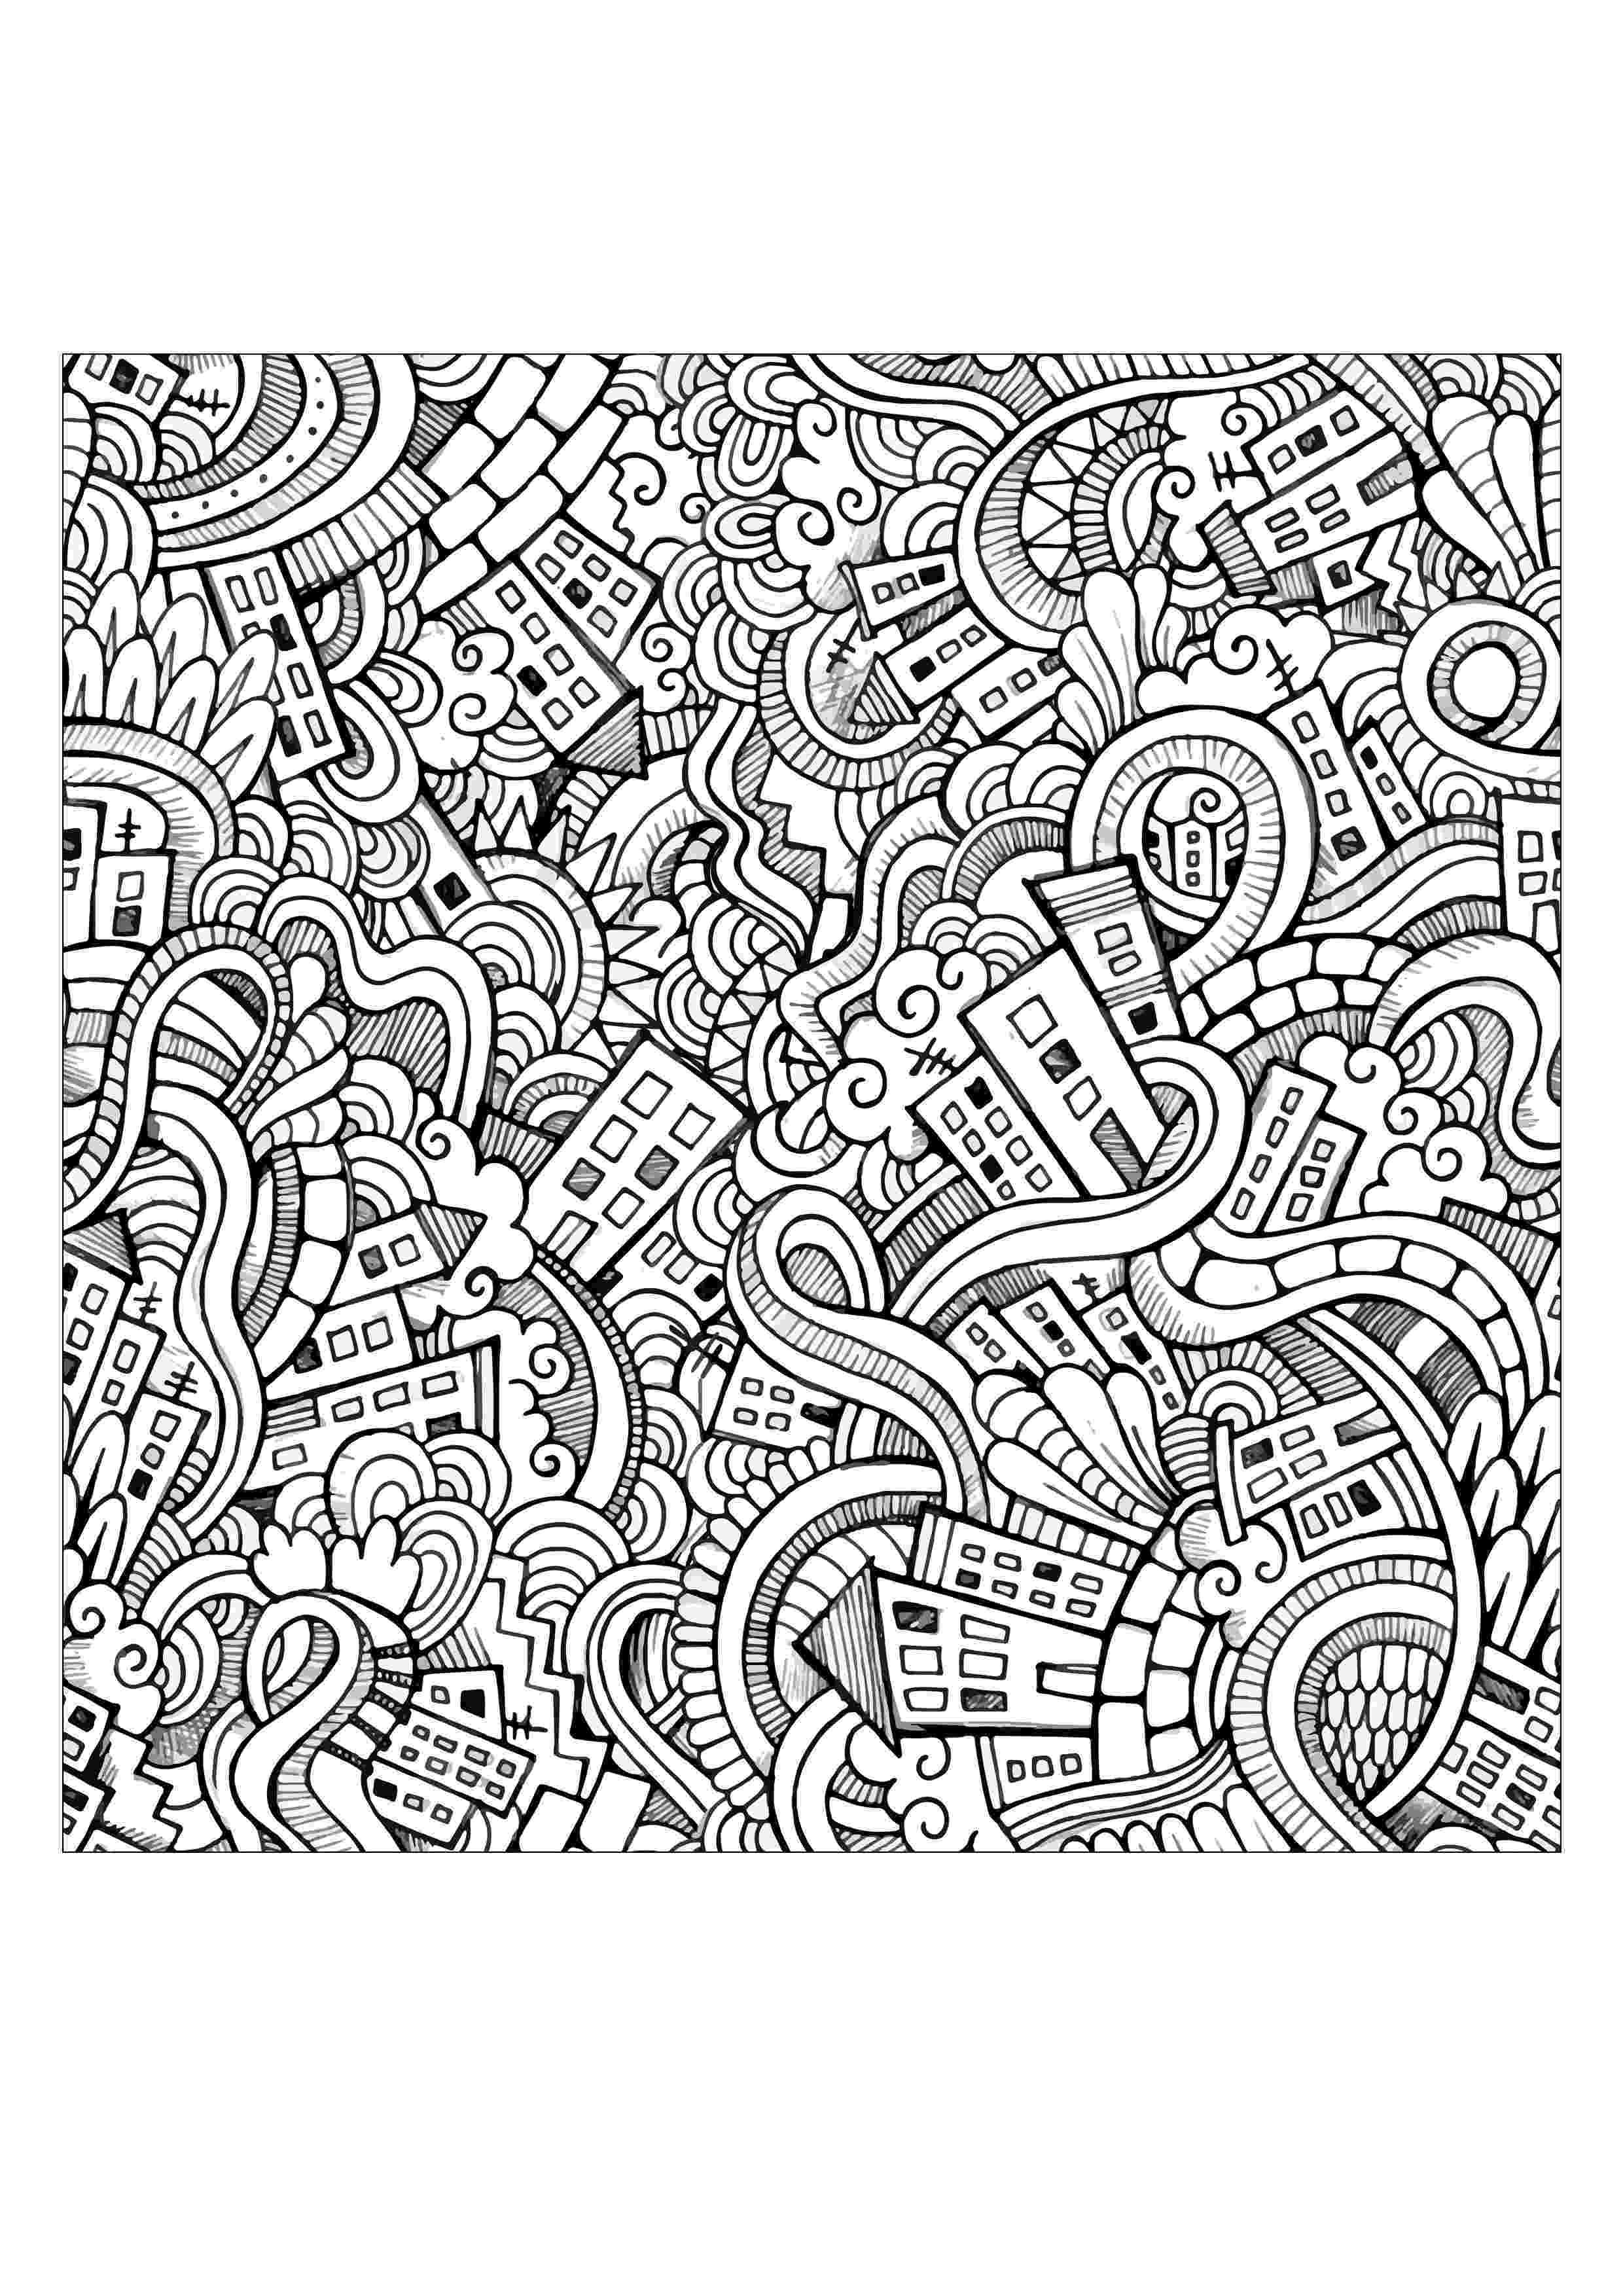 doodle art colouring angela porter20170118001editedsmall coloring pages in art colouring doodle